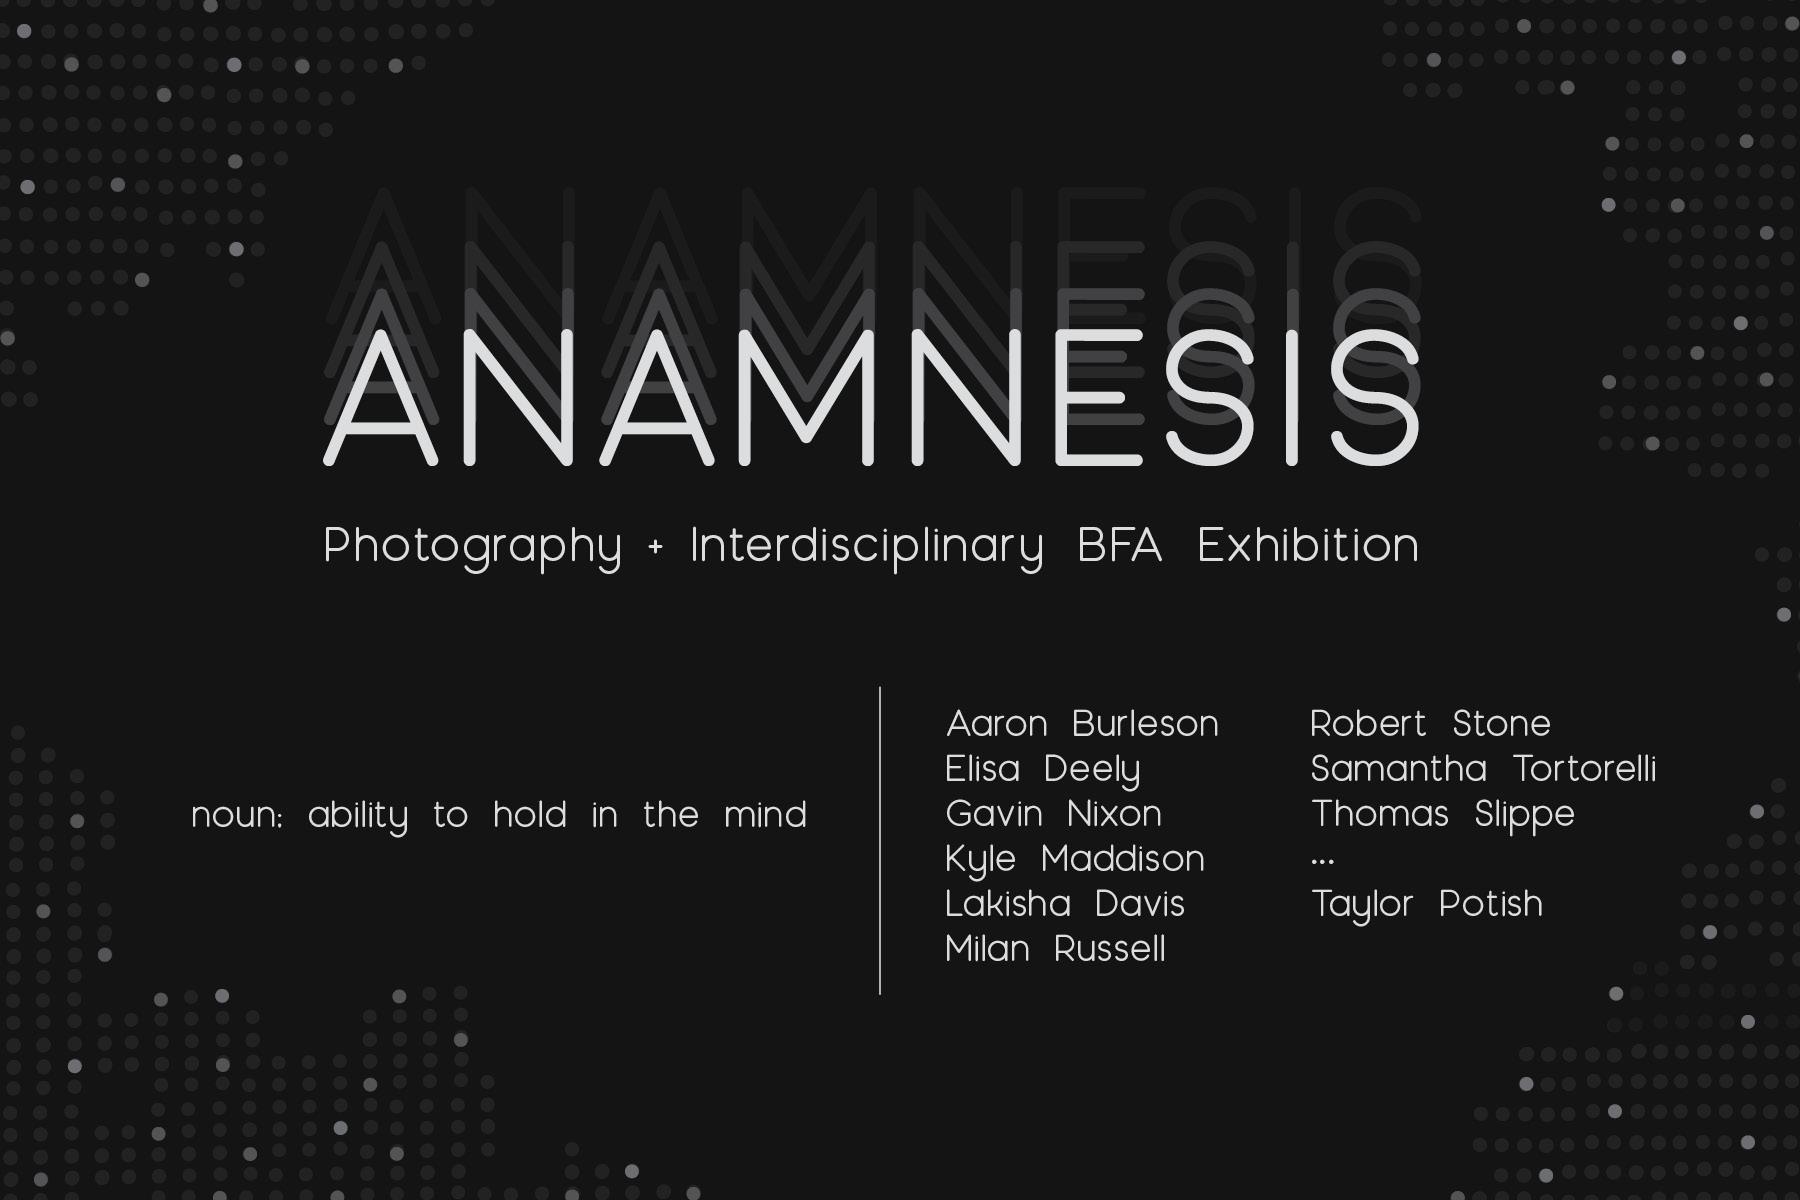 Anamnesis_BusinessCardAdvert_Stone_v1.jpg